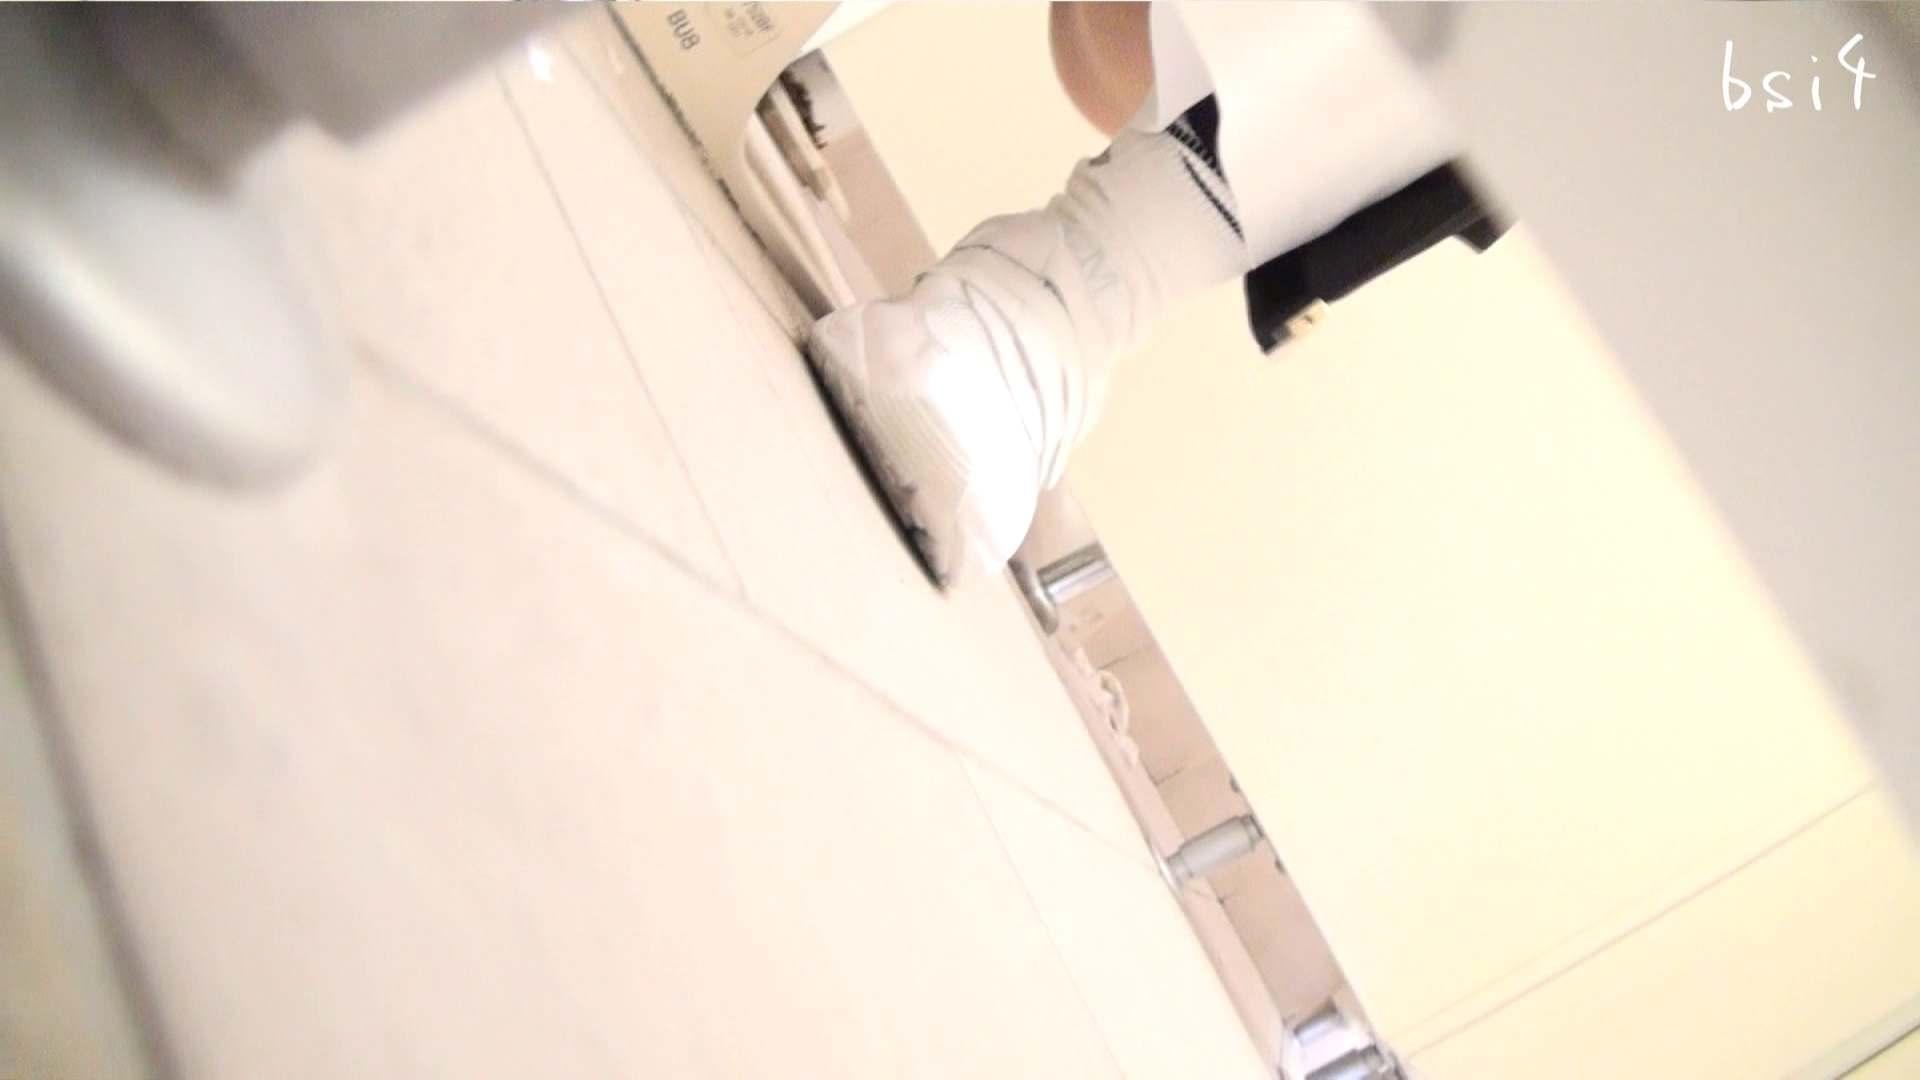 至高下半身盗撮-PREMIUM-【院内病棟編 】VOL4 OLの実態   盗撮  86pic 57